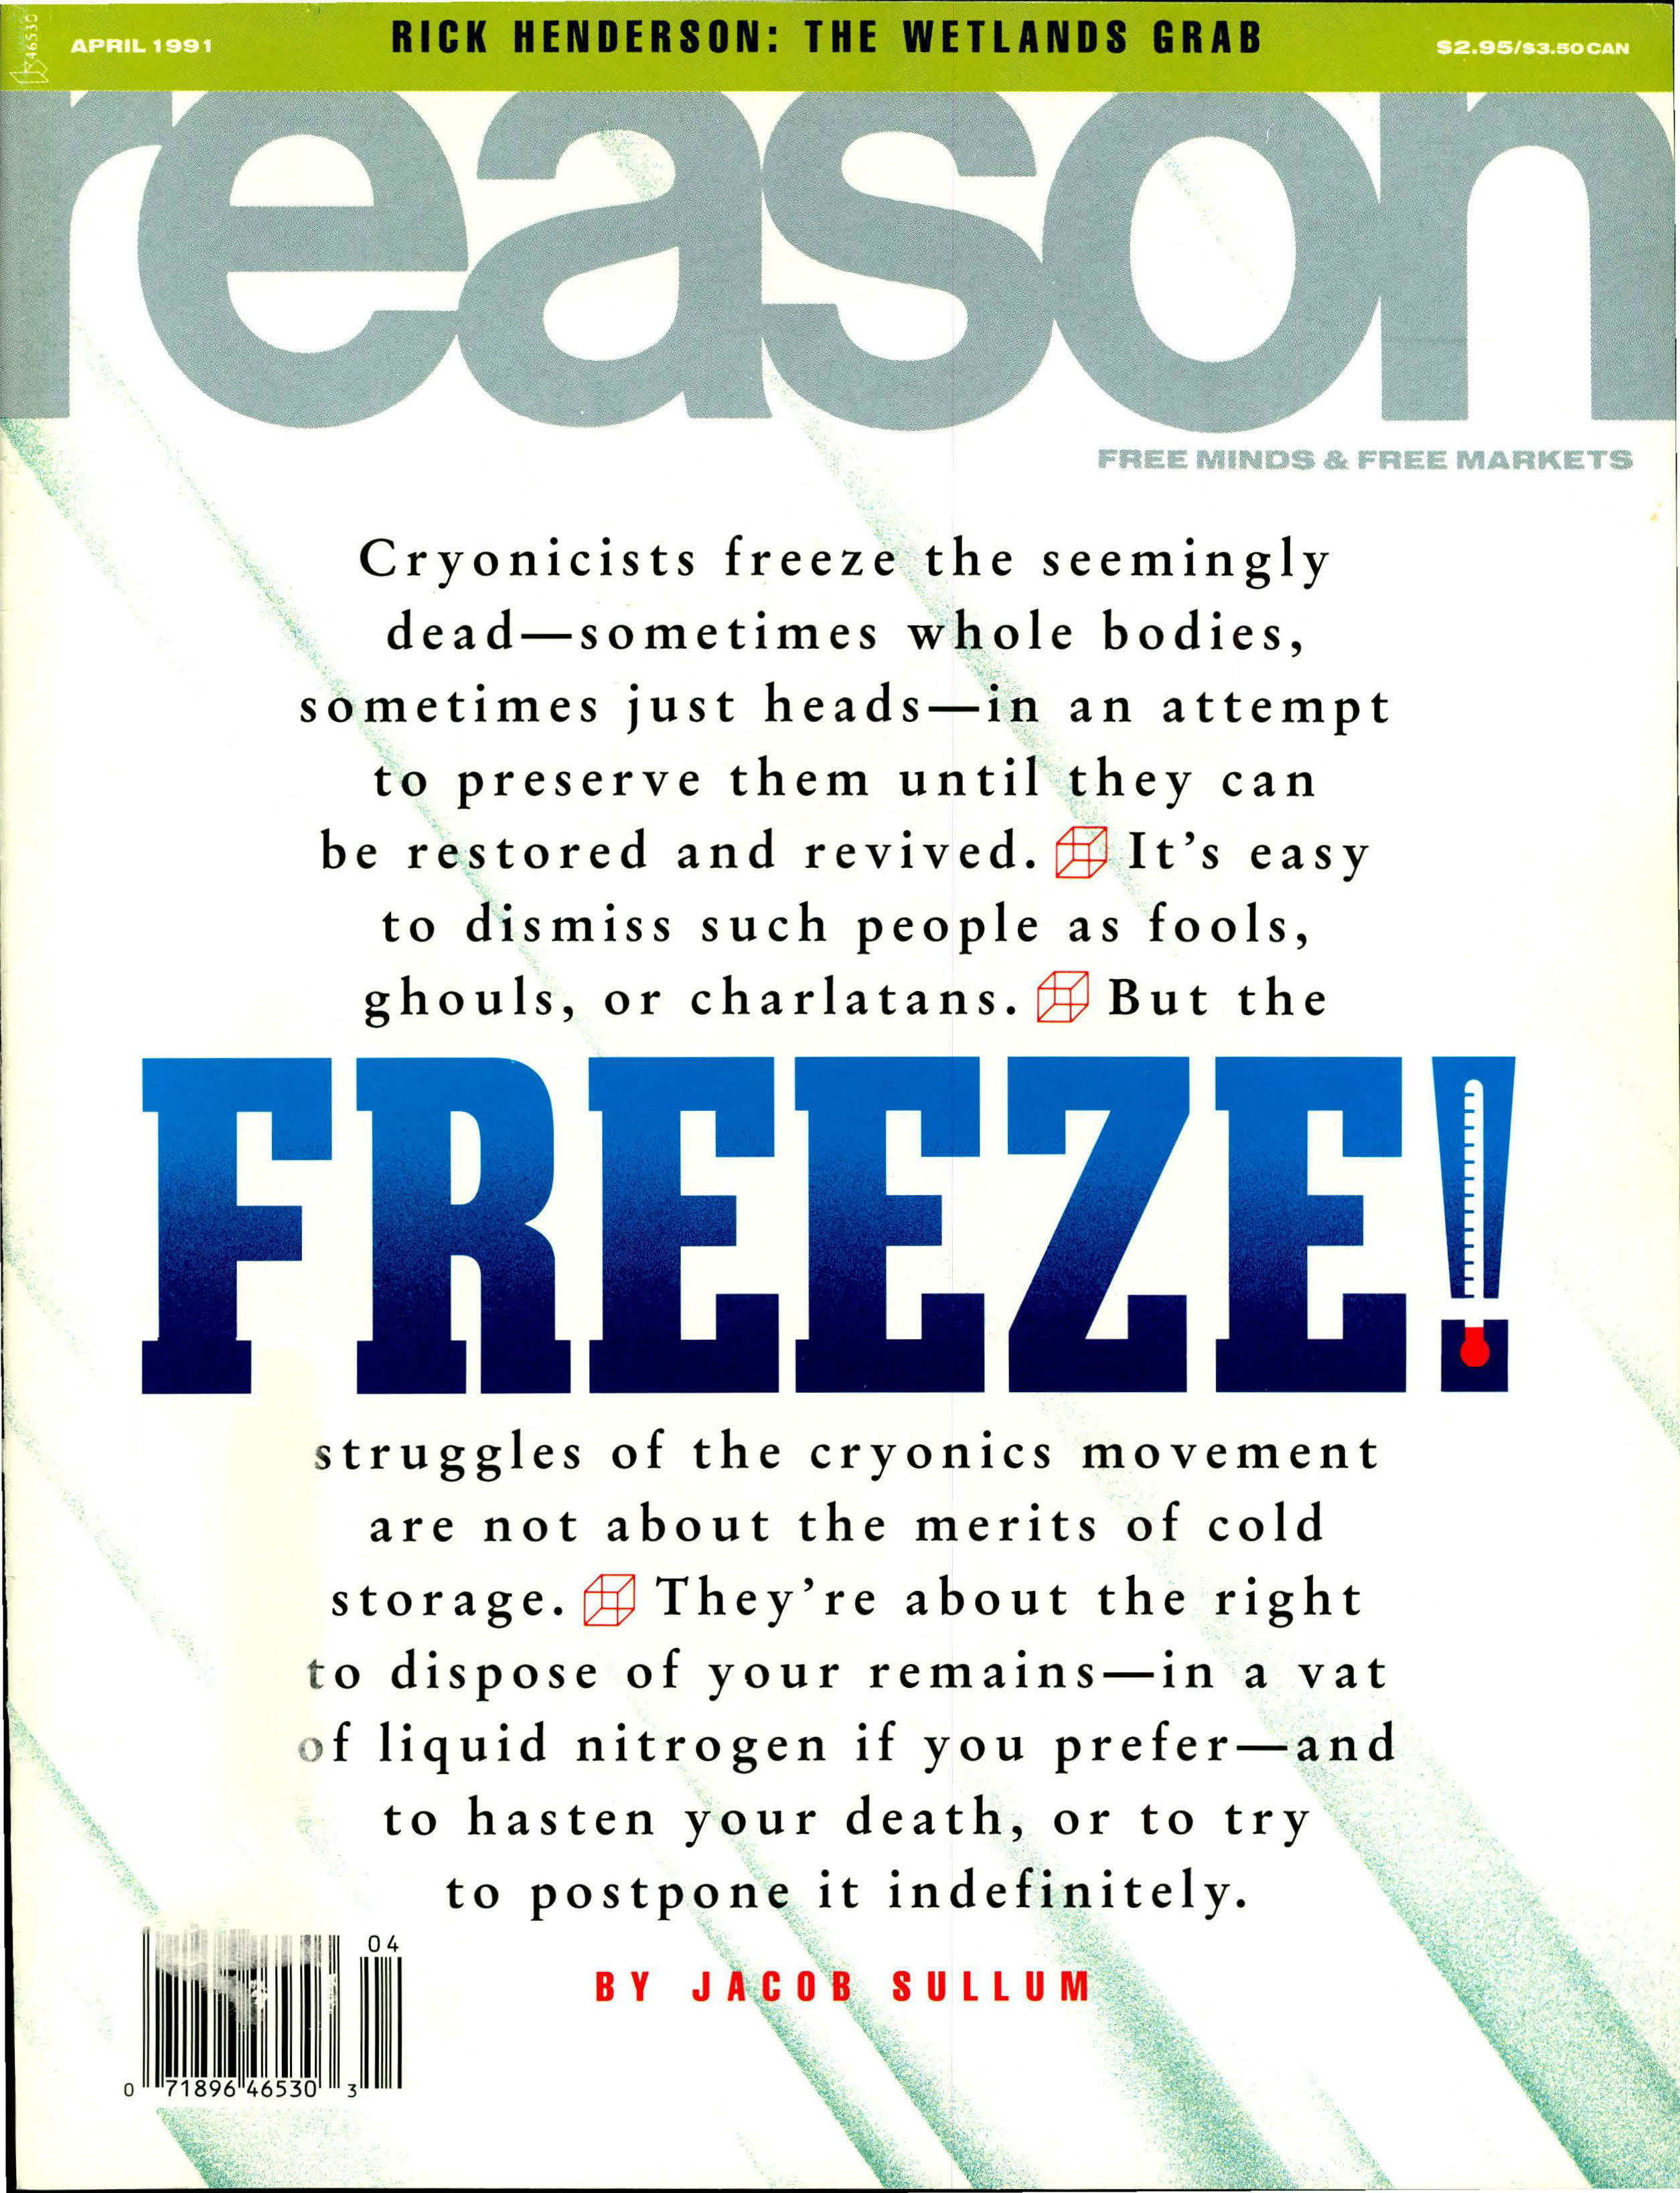 Reason Magazine, April 1991 cover image